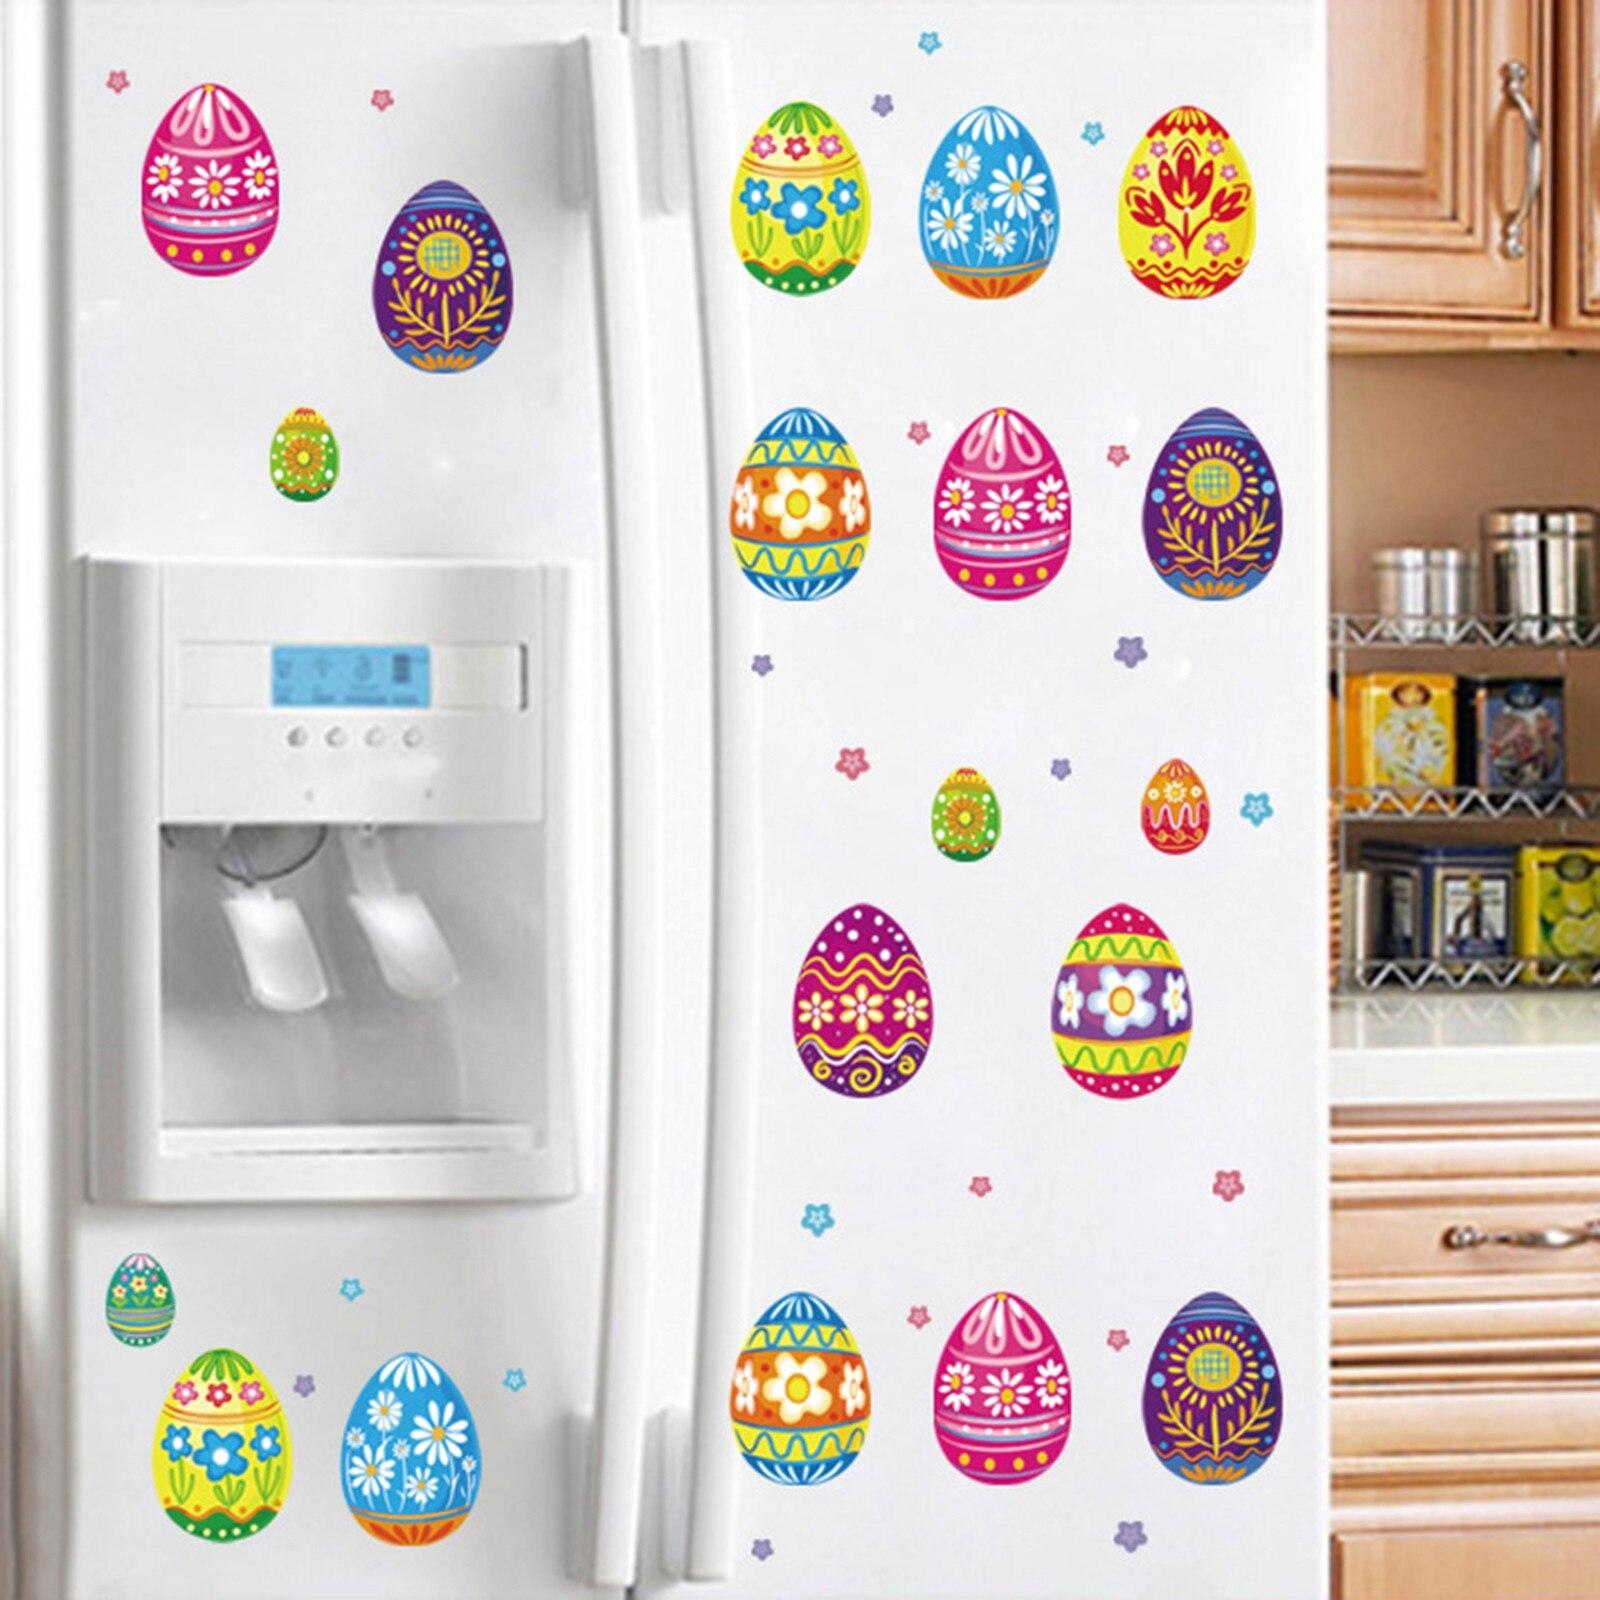 Imán de conejo de pascua, calcomanía para refrigerador, decoración de dibujos animados...